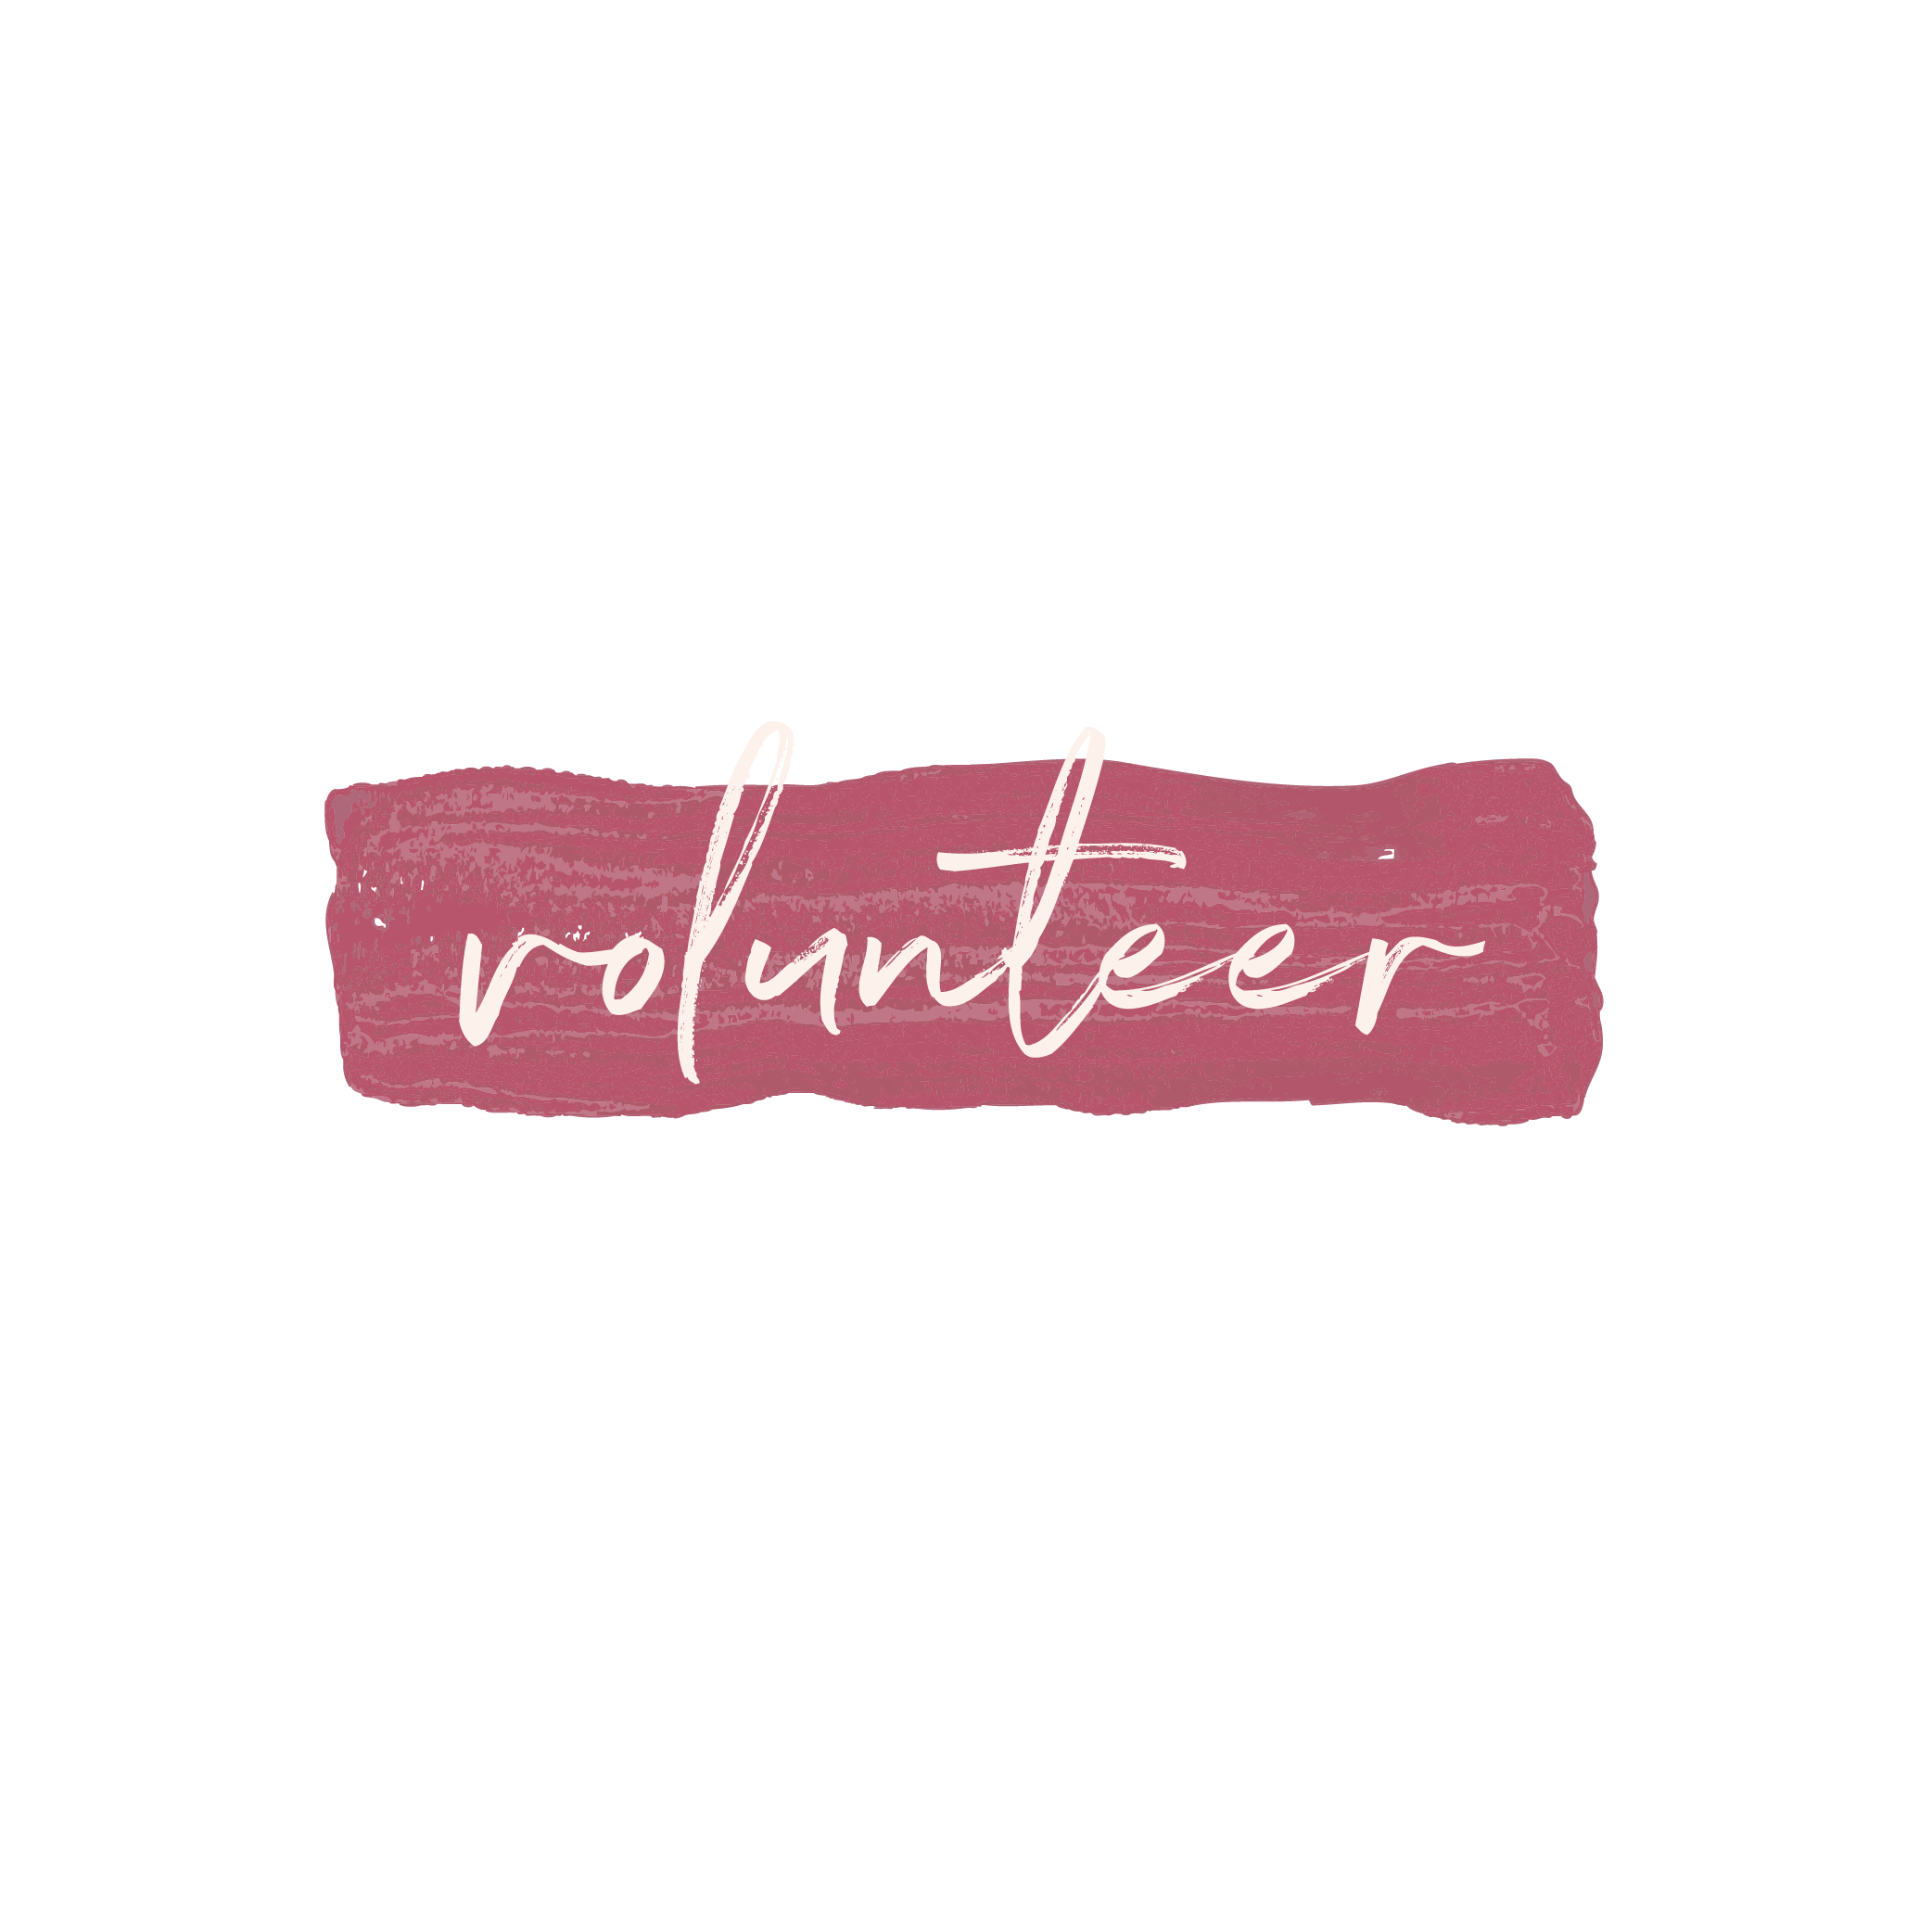 Copy of Copy of volunteer